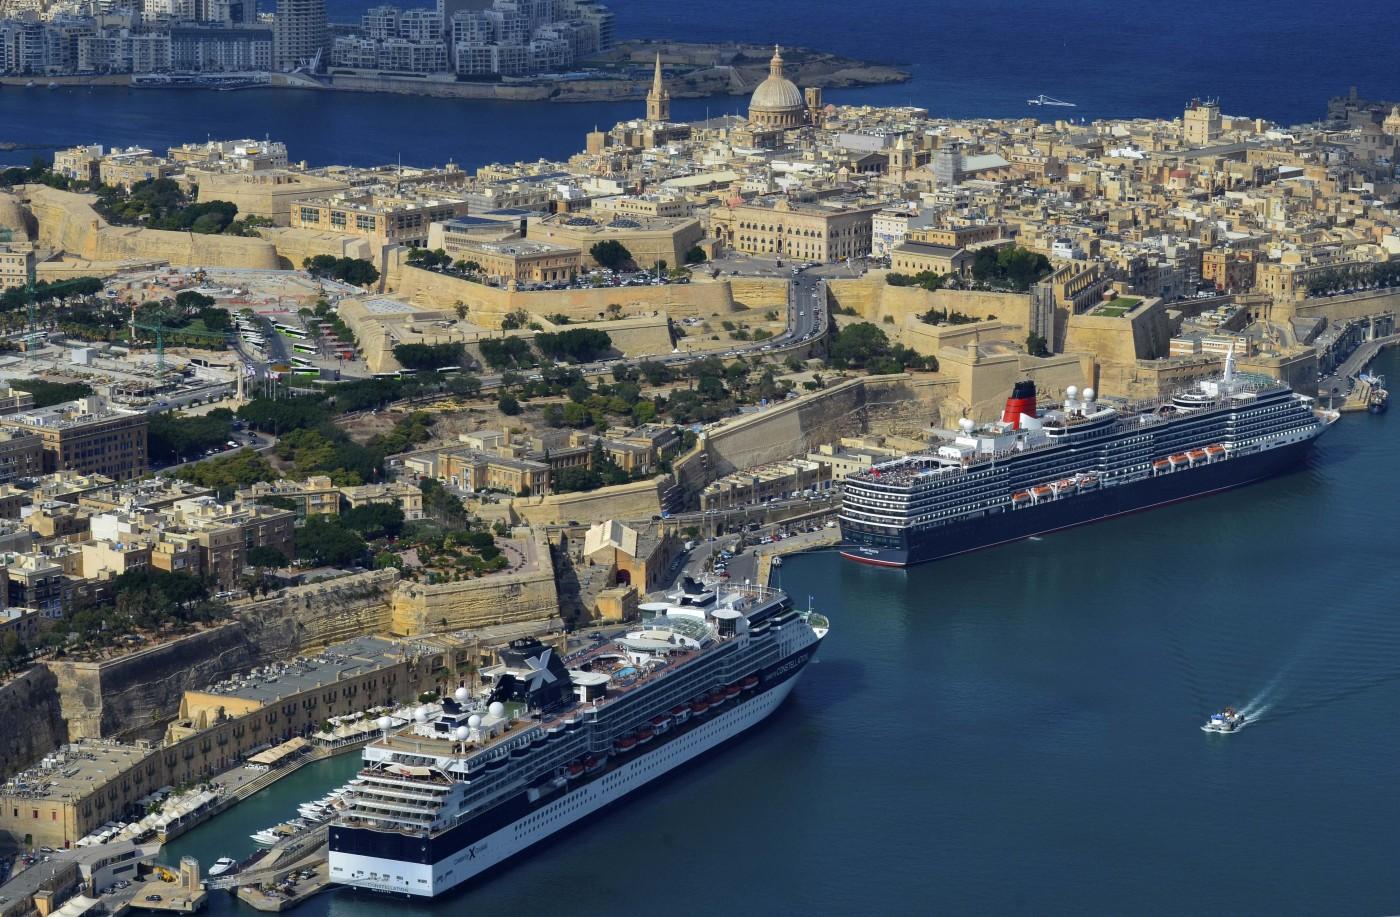 Port pro of the month: Joseph Bugeja (MLT)